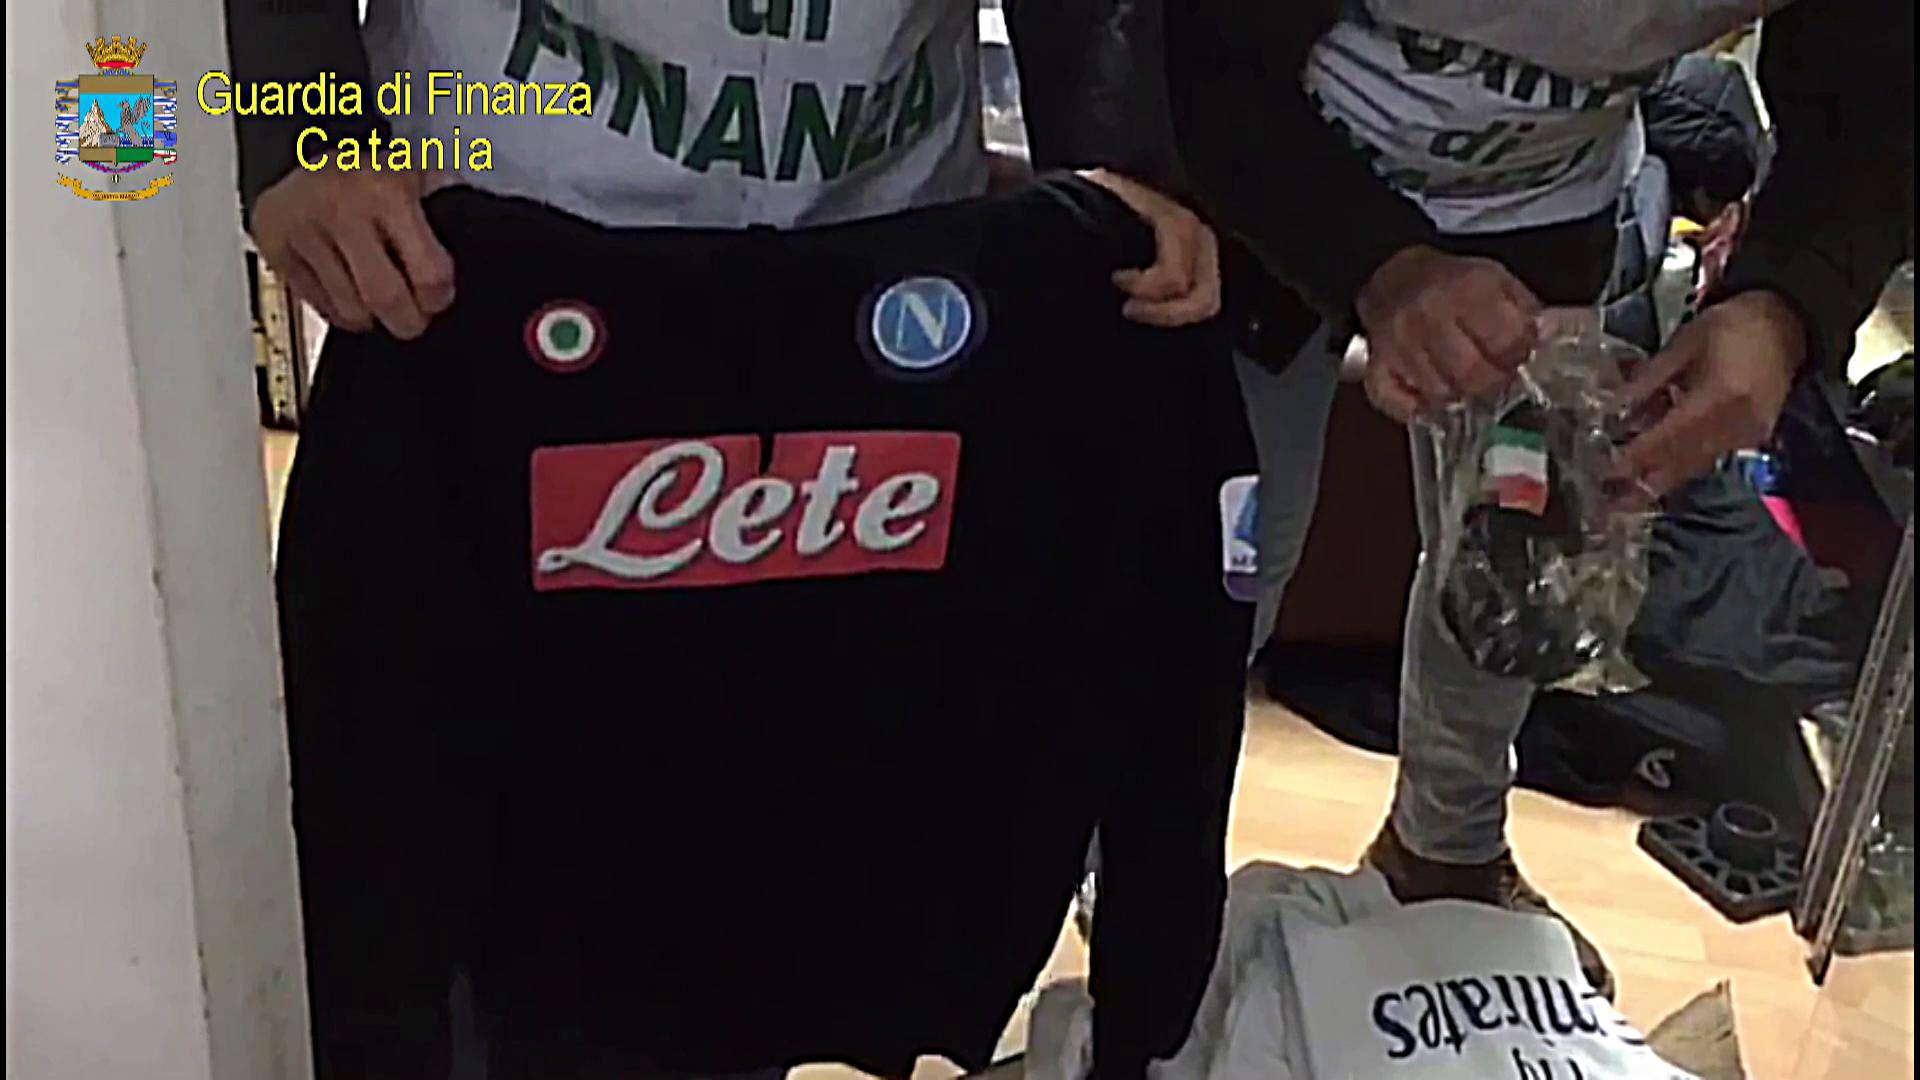 Mascherine e capi d'abbigliamento contraffatti venduti online: denunciati due fratelli catanesi – FOTO